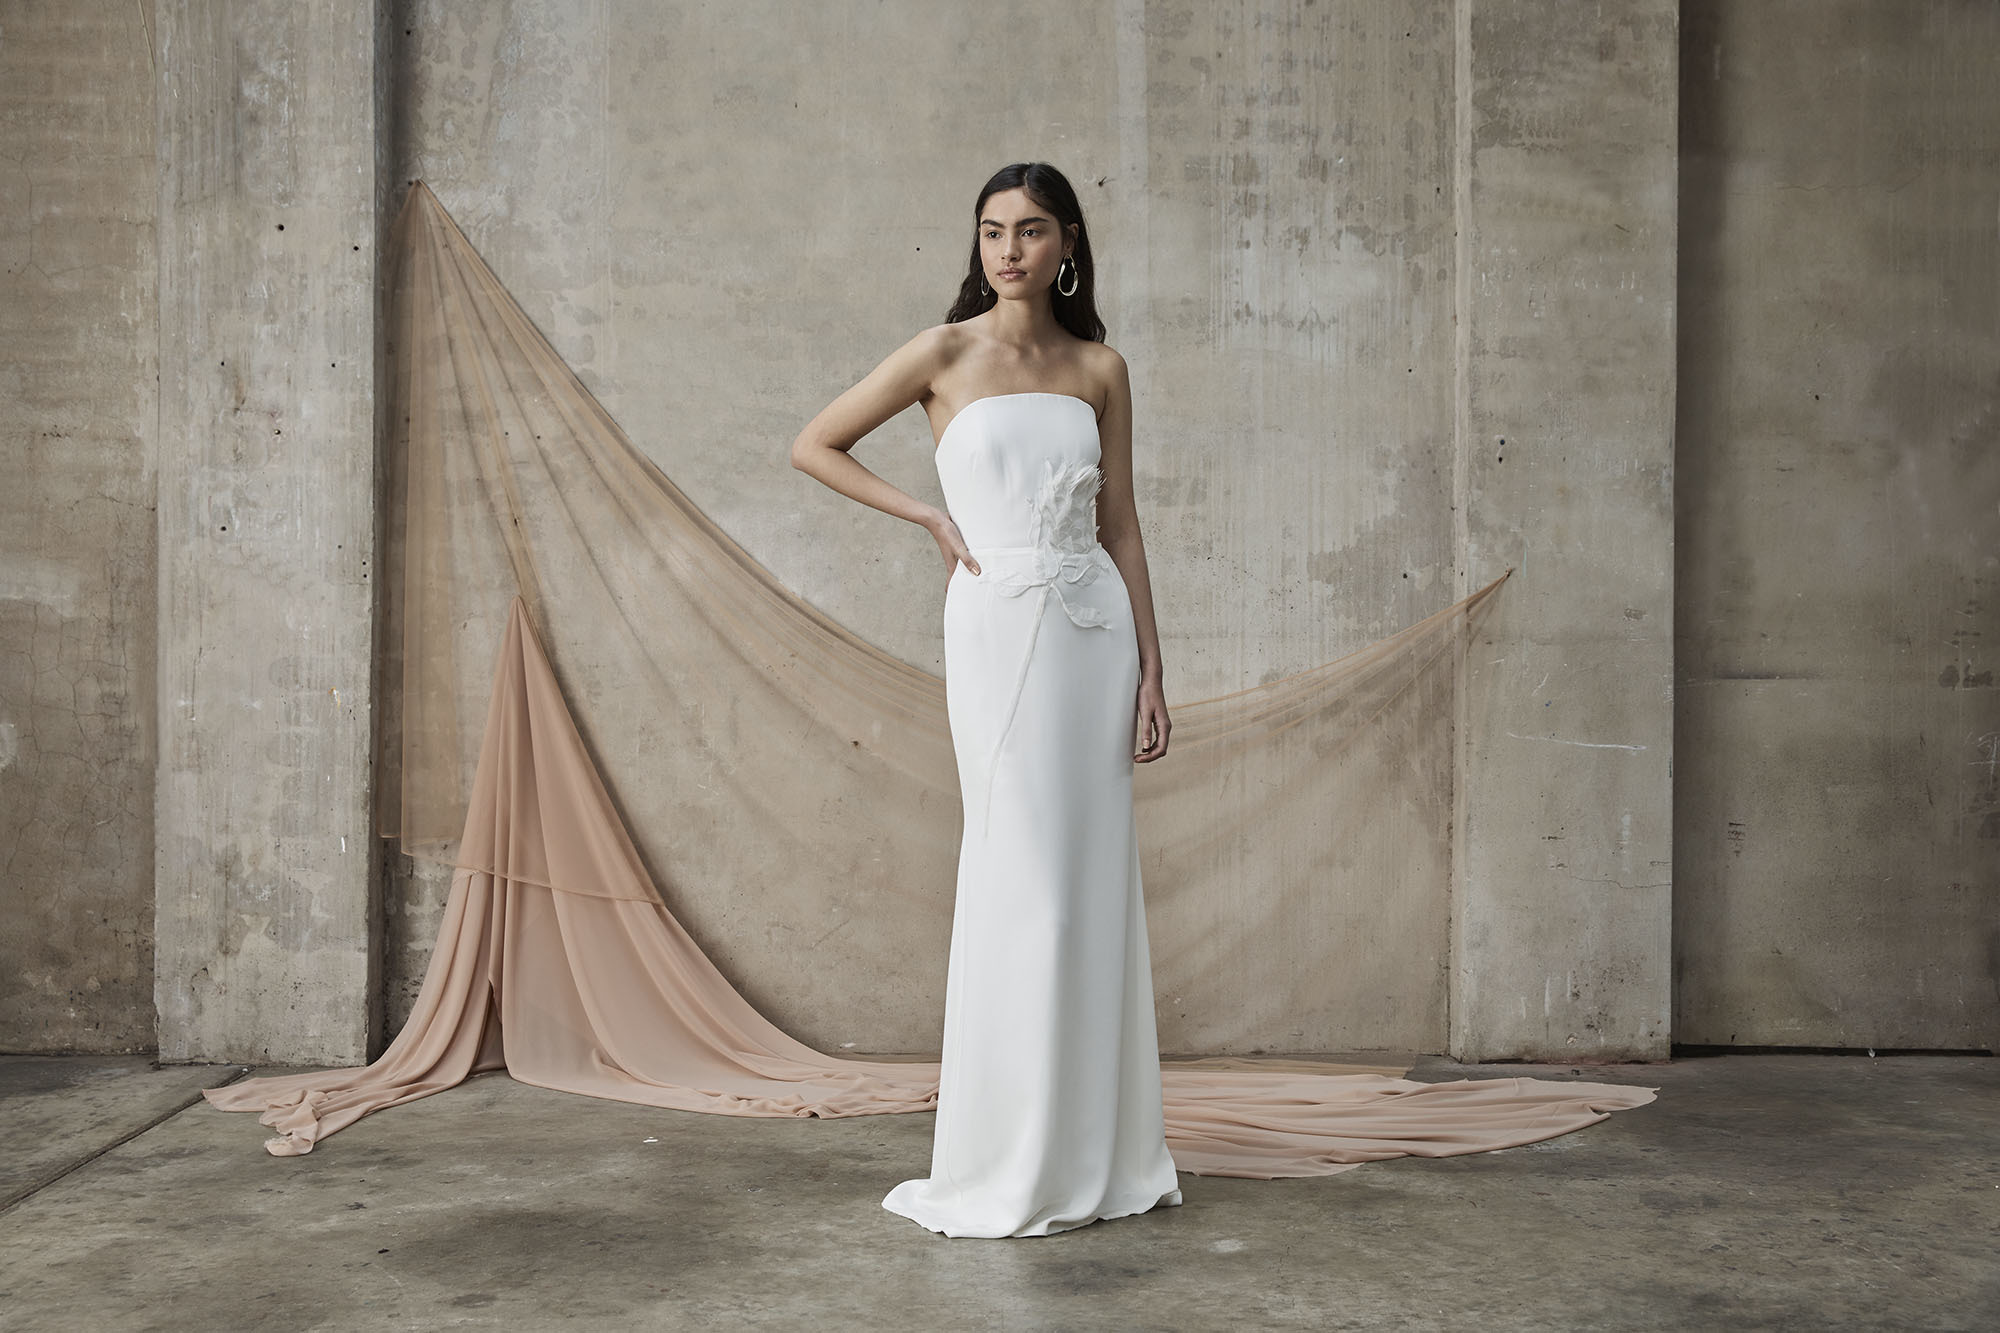 protea gown dress photo